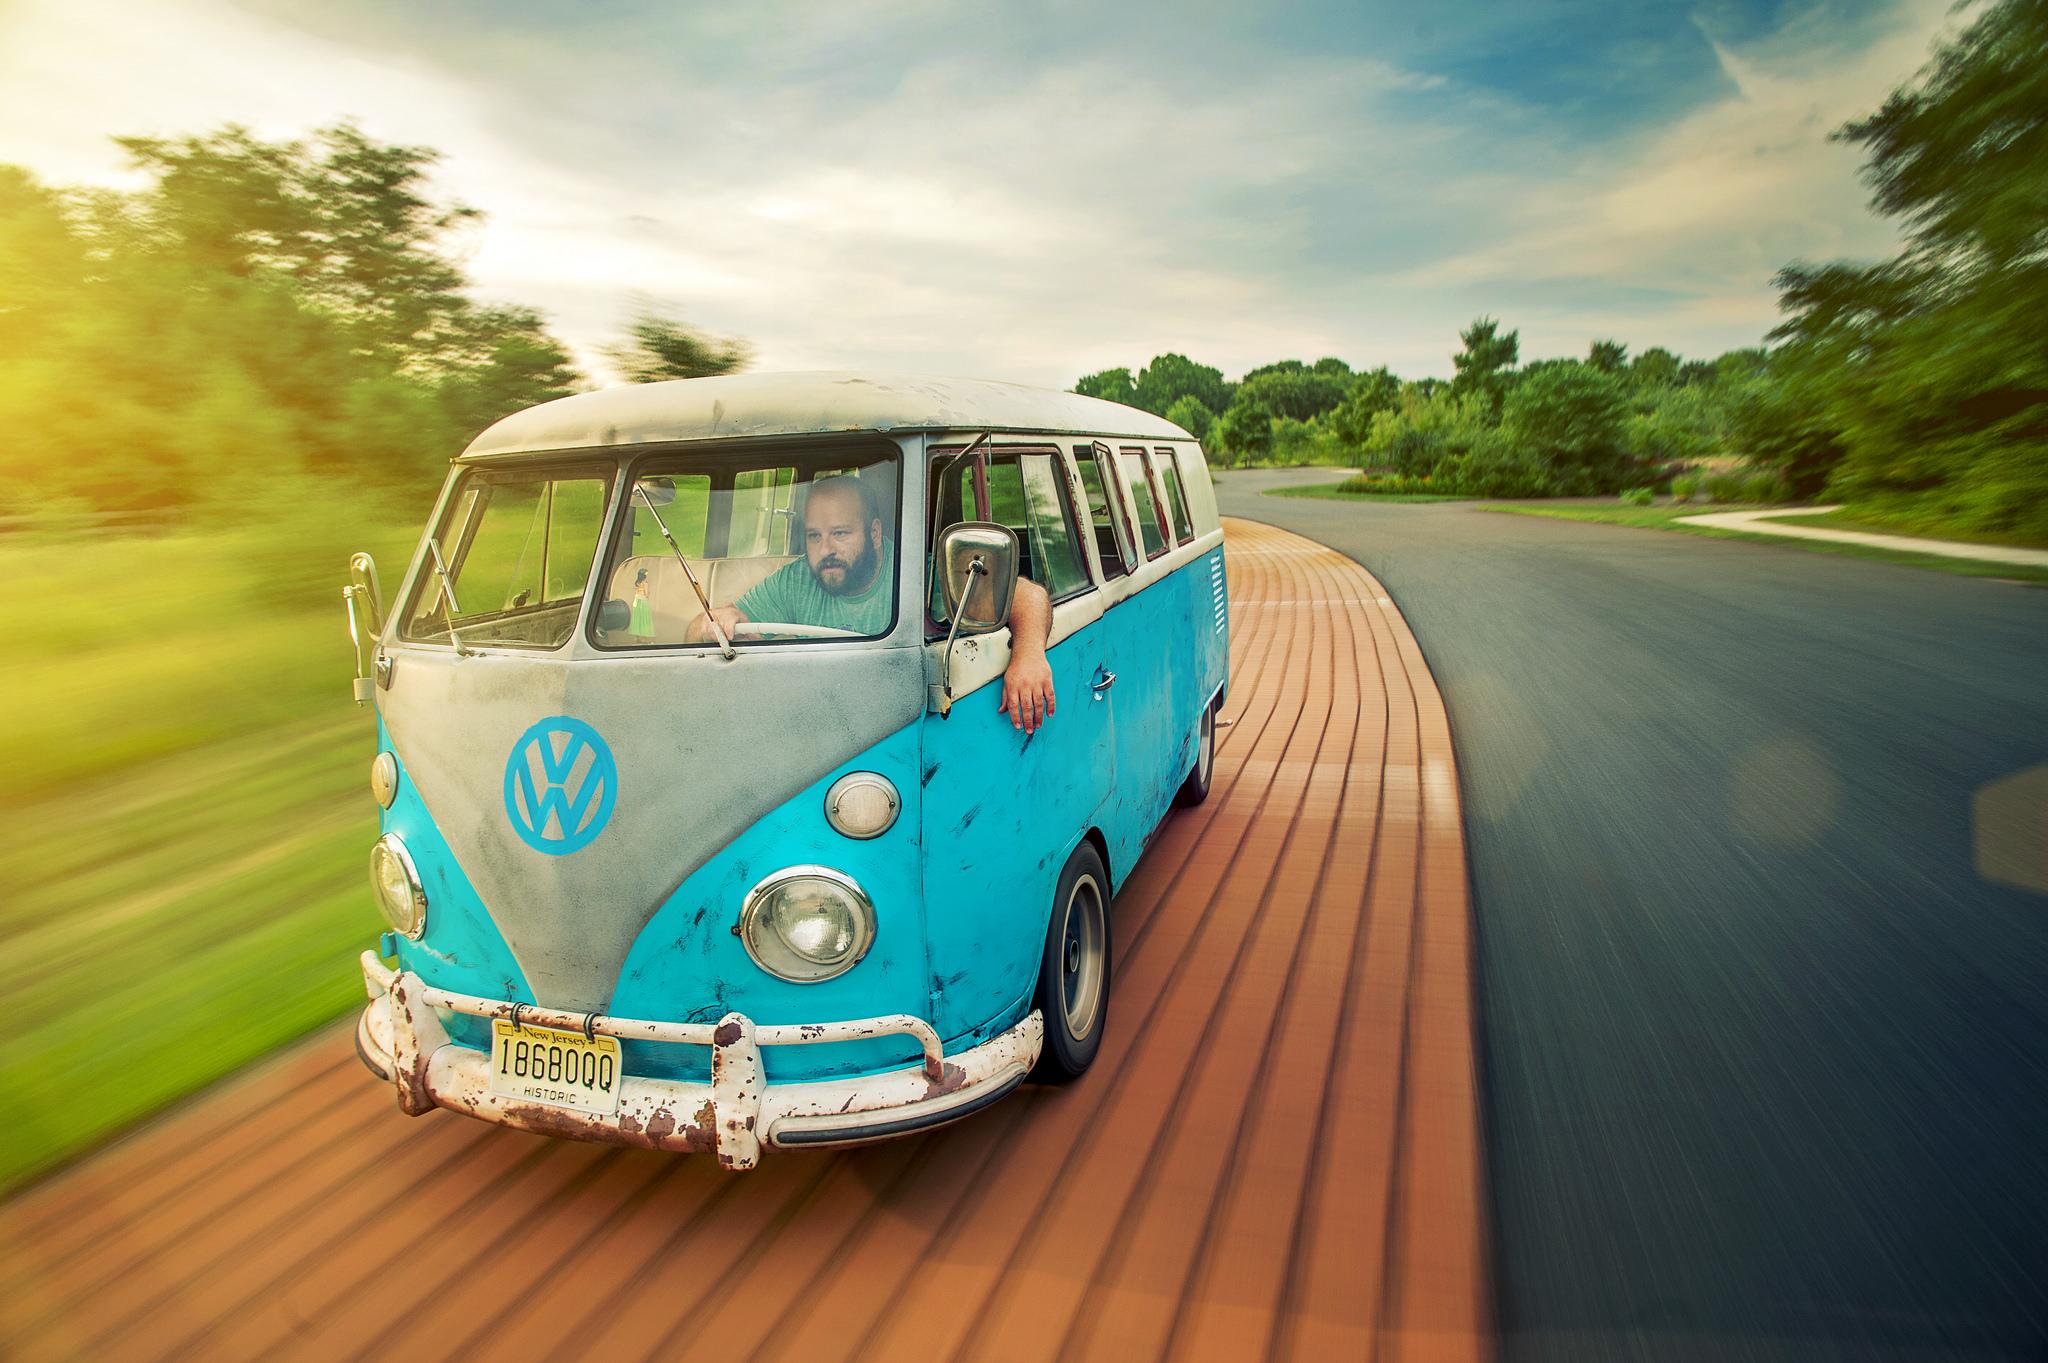 Un Volkswagen del 67 - 2048x1363